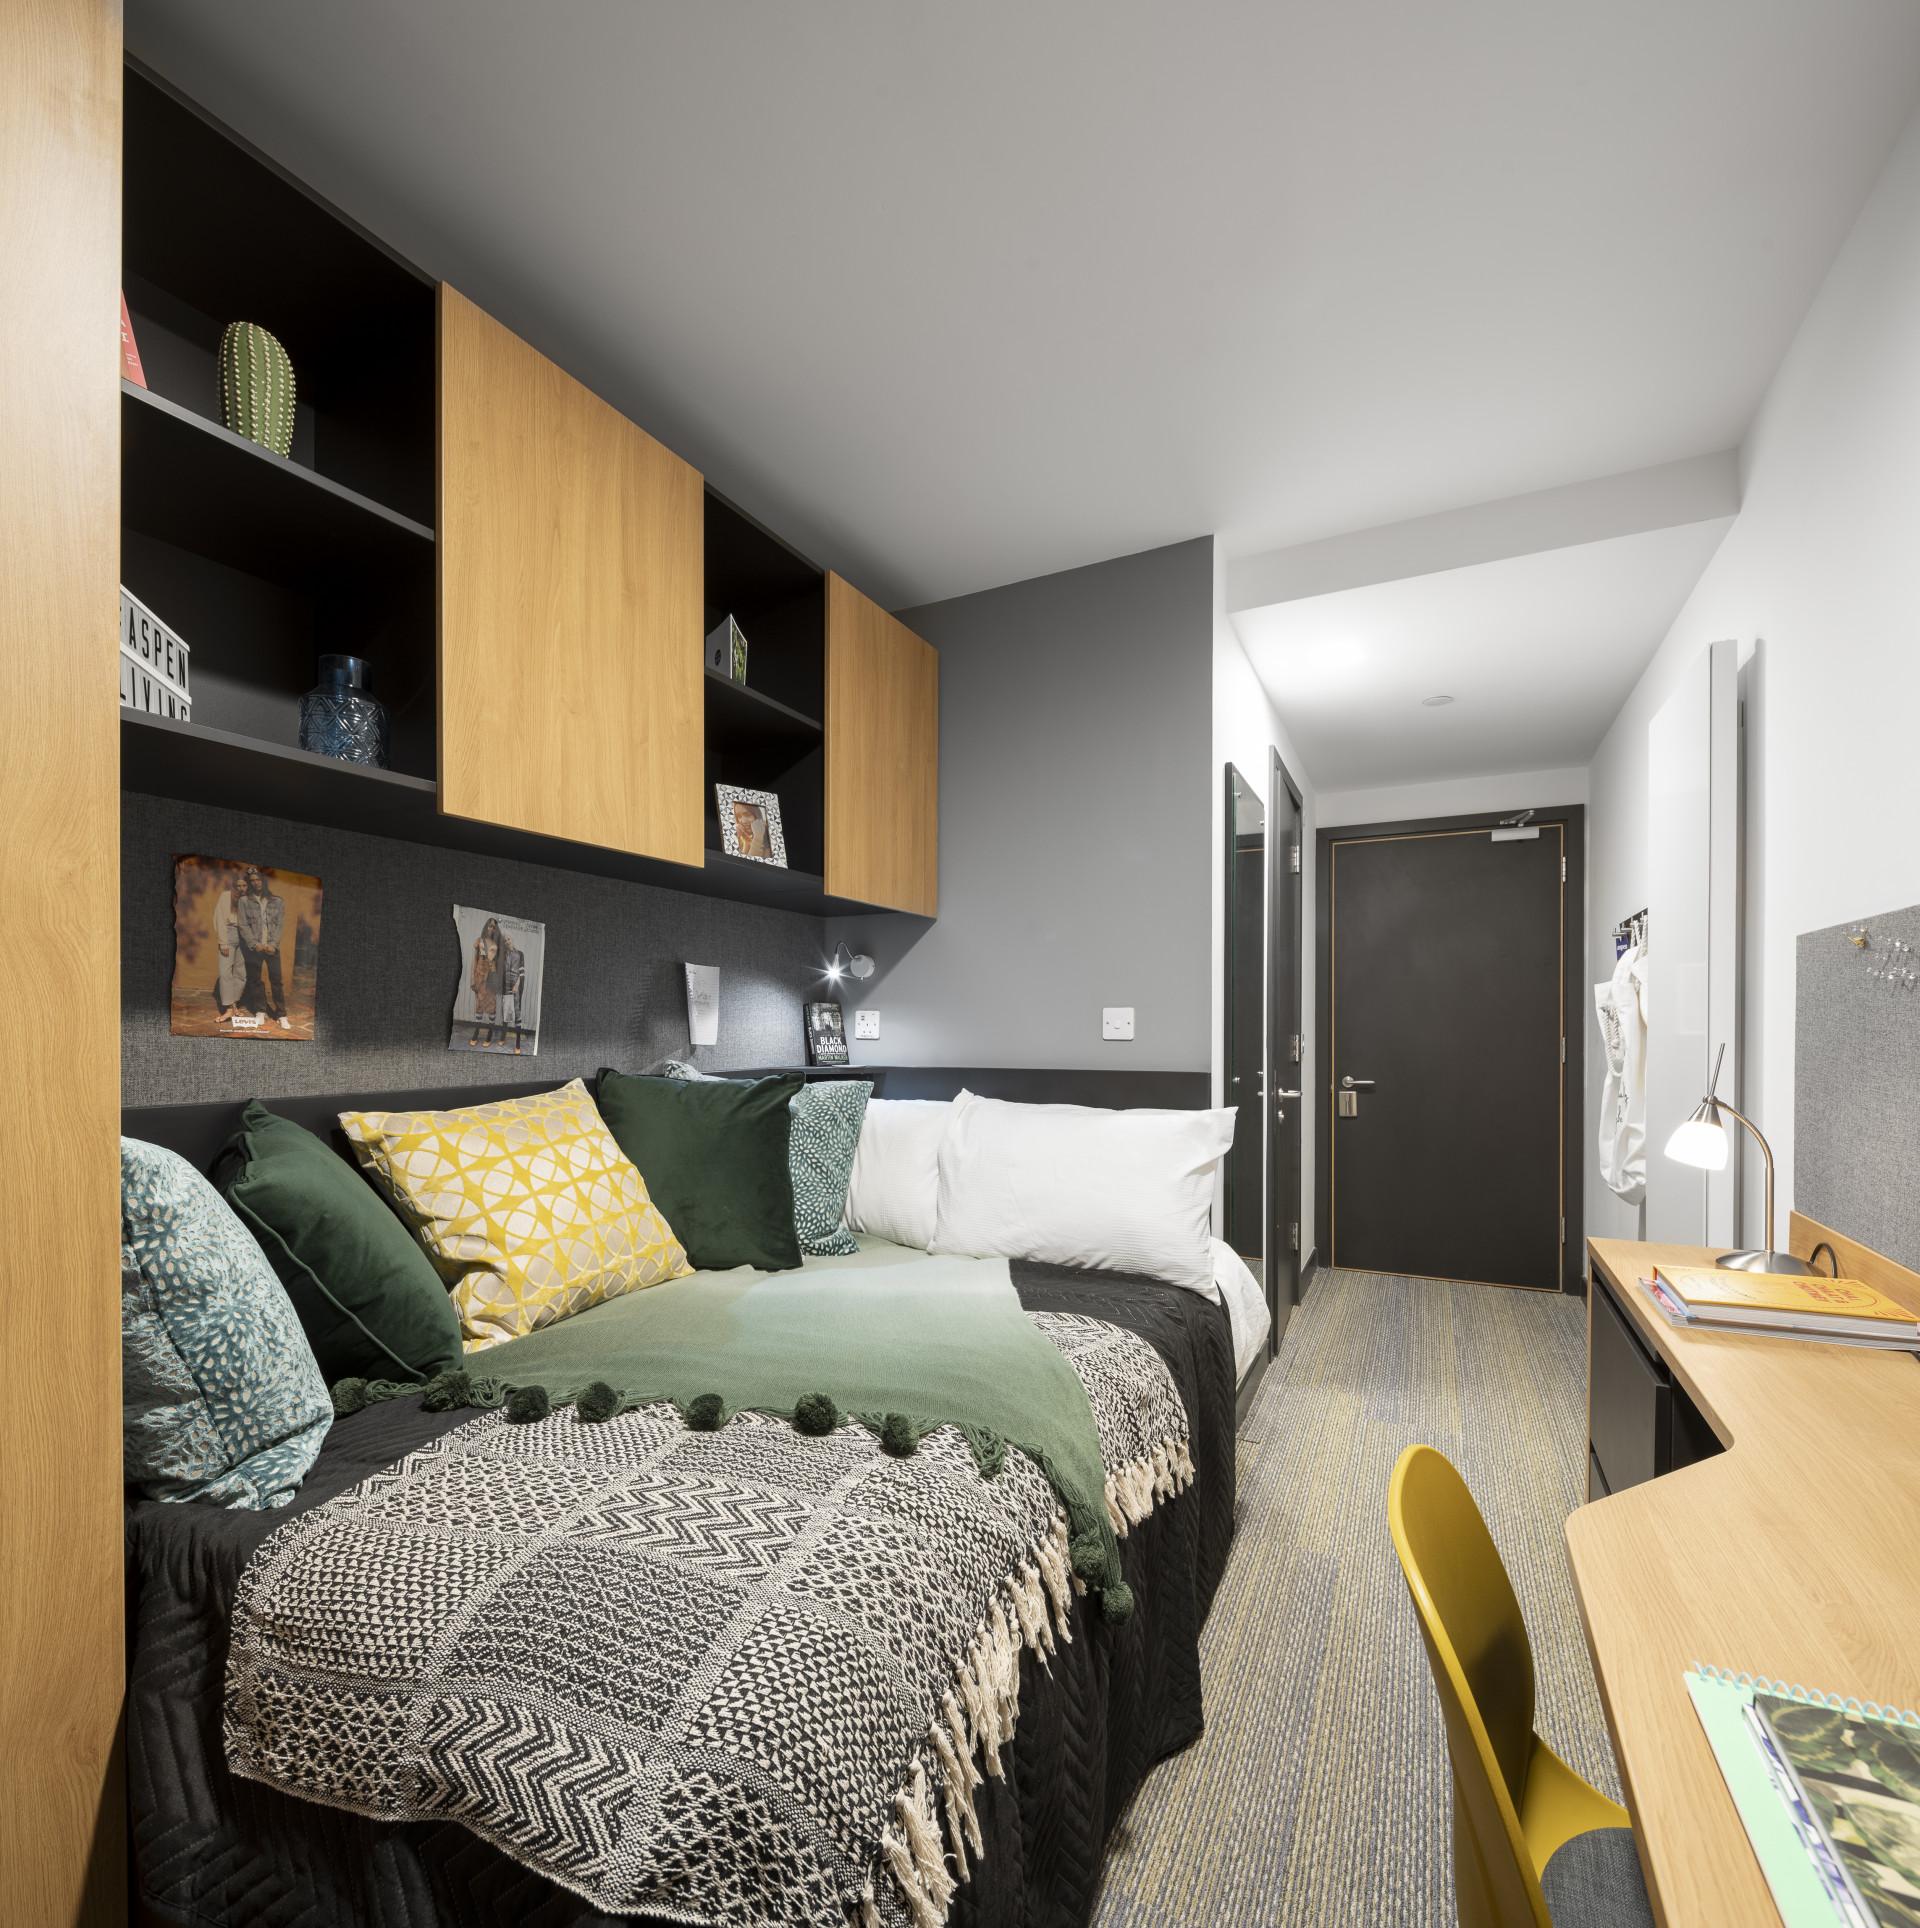 Ensuite (7 Bed) High Floor